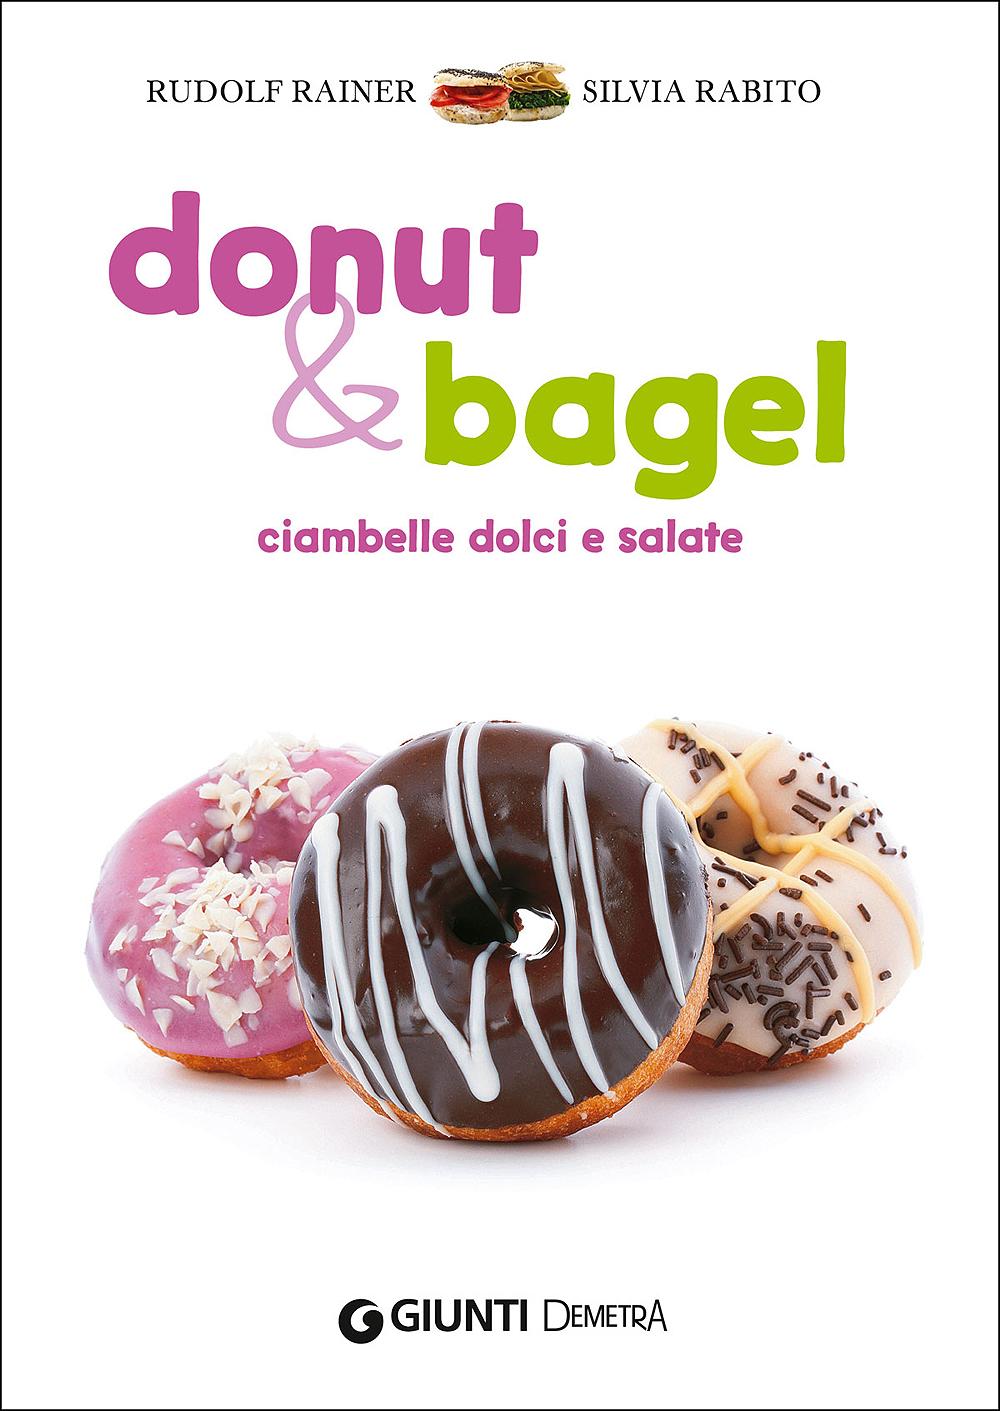 Donut & bagel